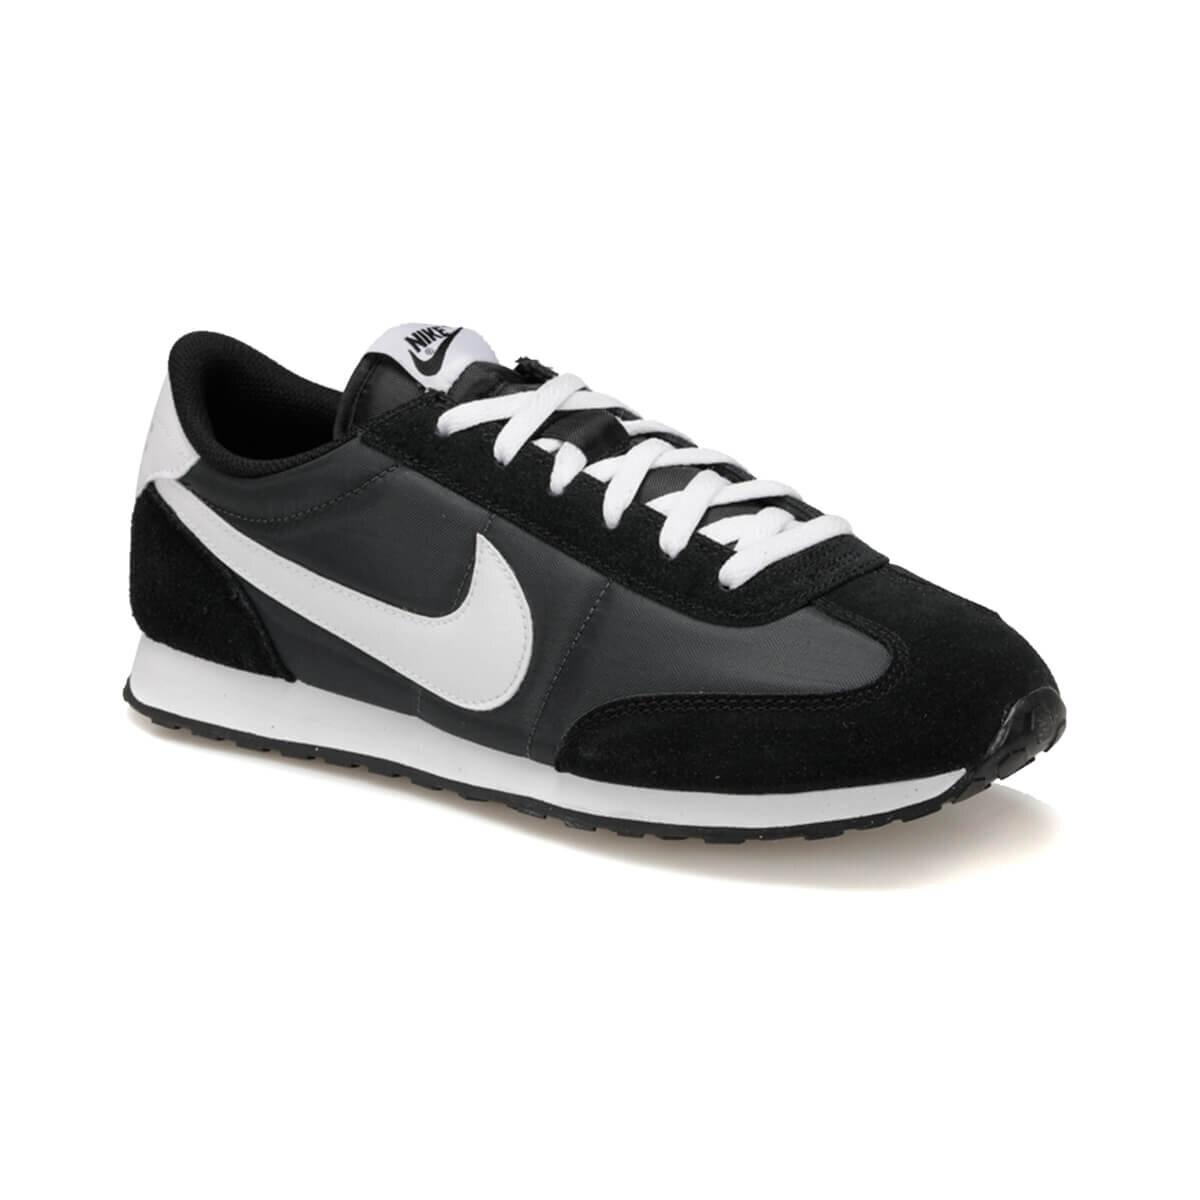 ANTRASIT Erkek Sneaker Ayakkabı MACH RUNNER